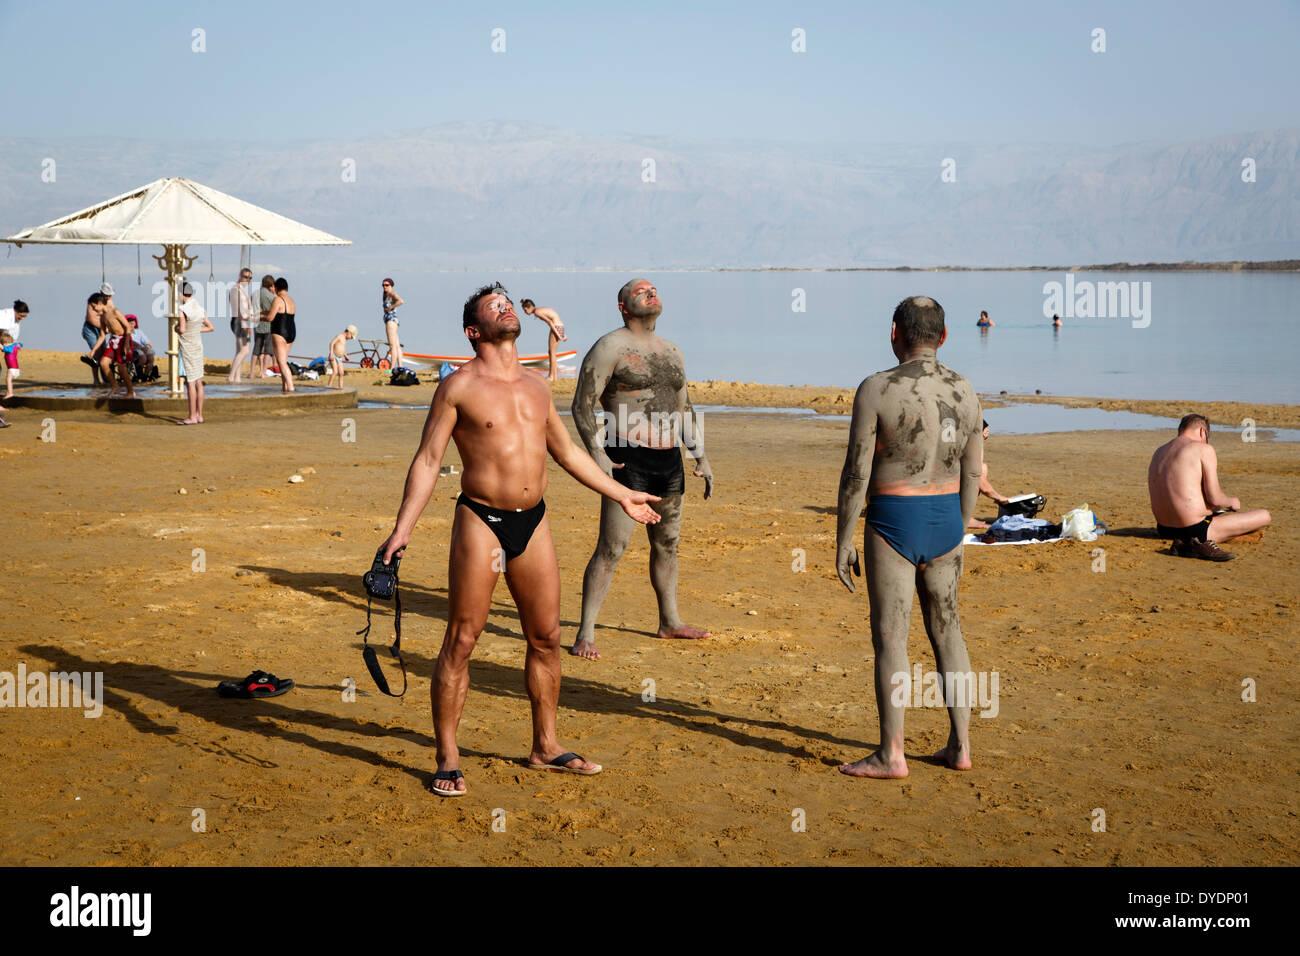 El Mar Muerto, Israel. Imagen De Stock